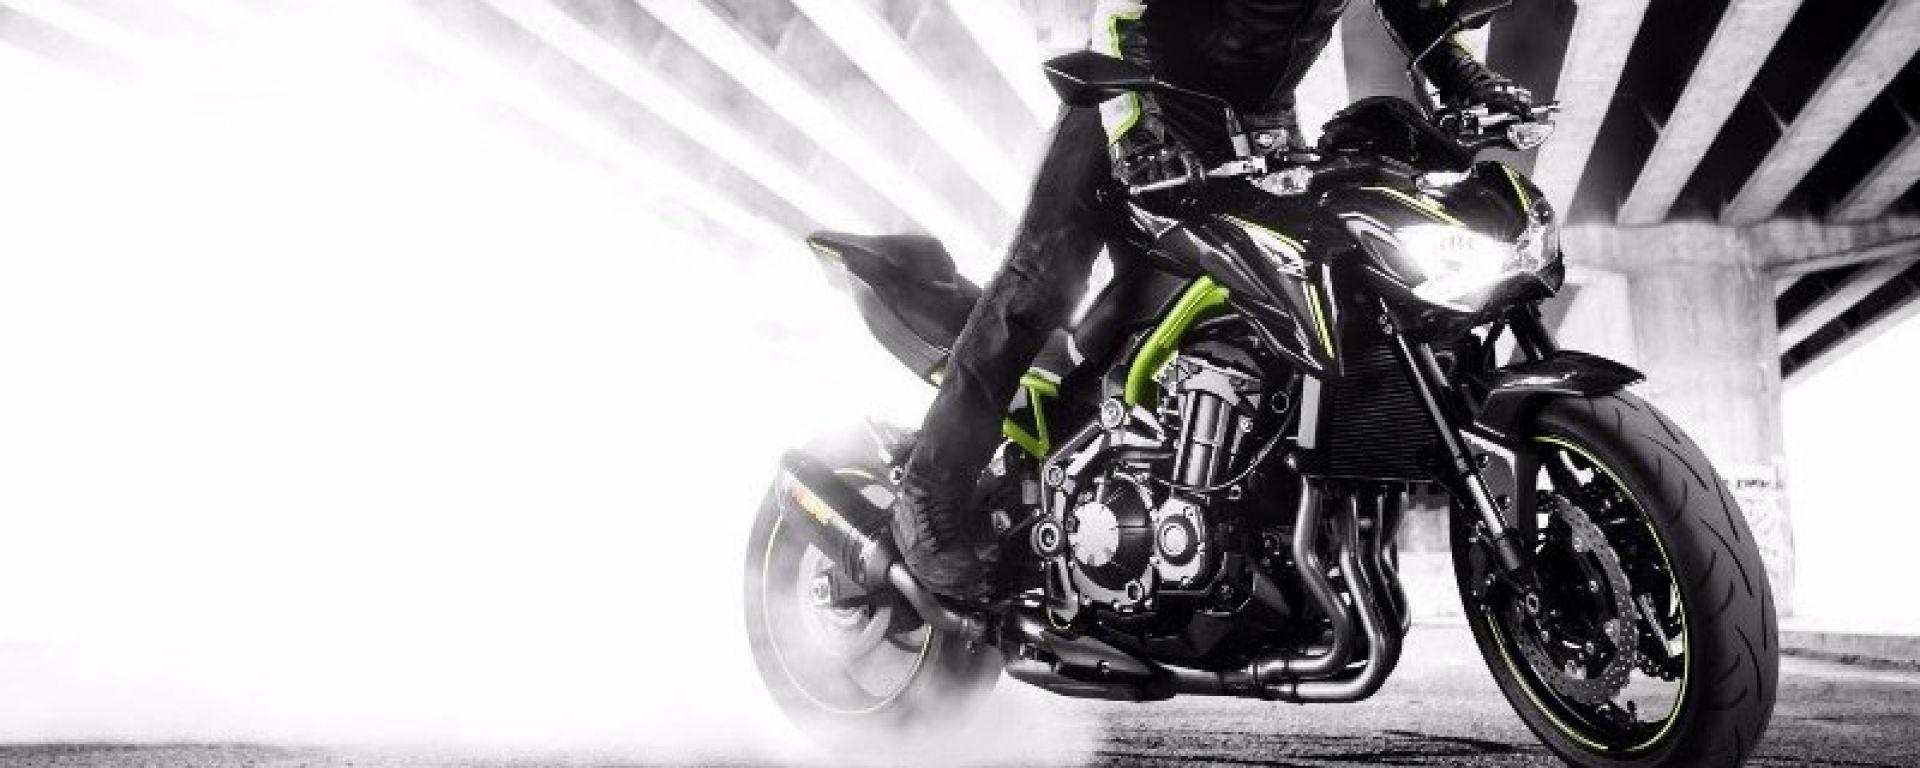 Kawasaki Z400 2019: la Ninja 400 scarenata arriverà a intermot